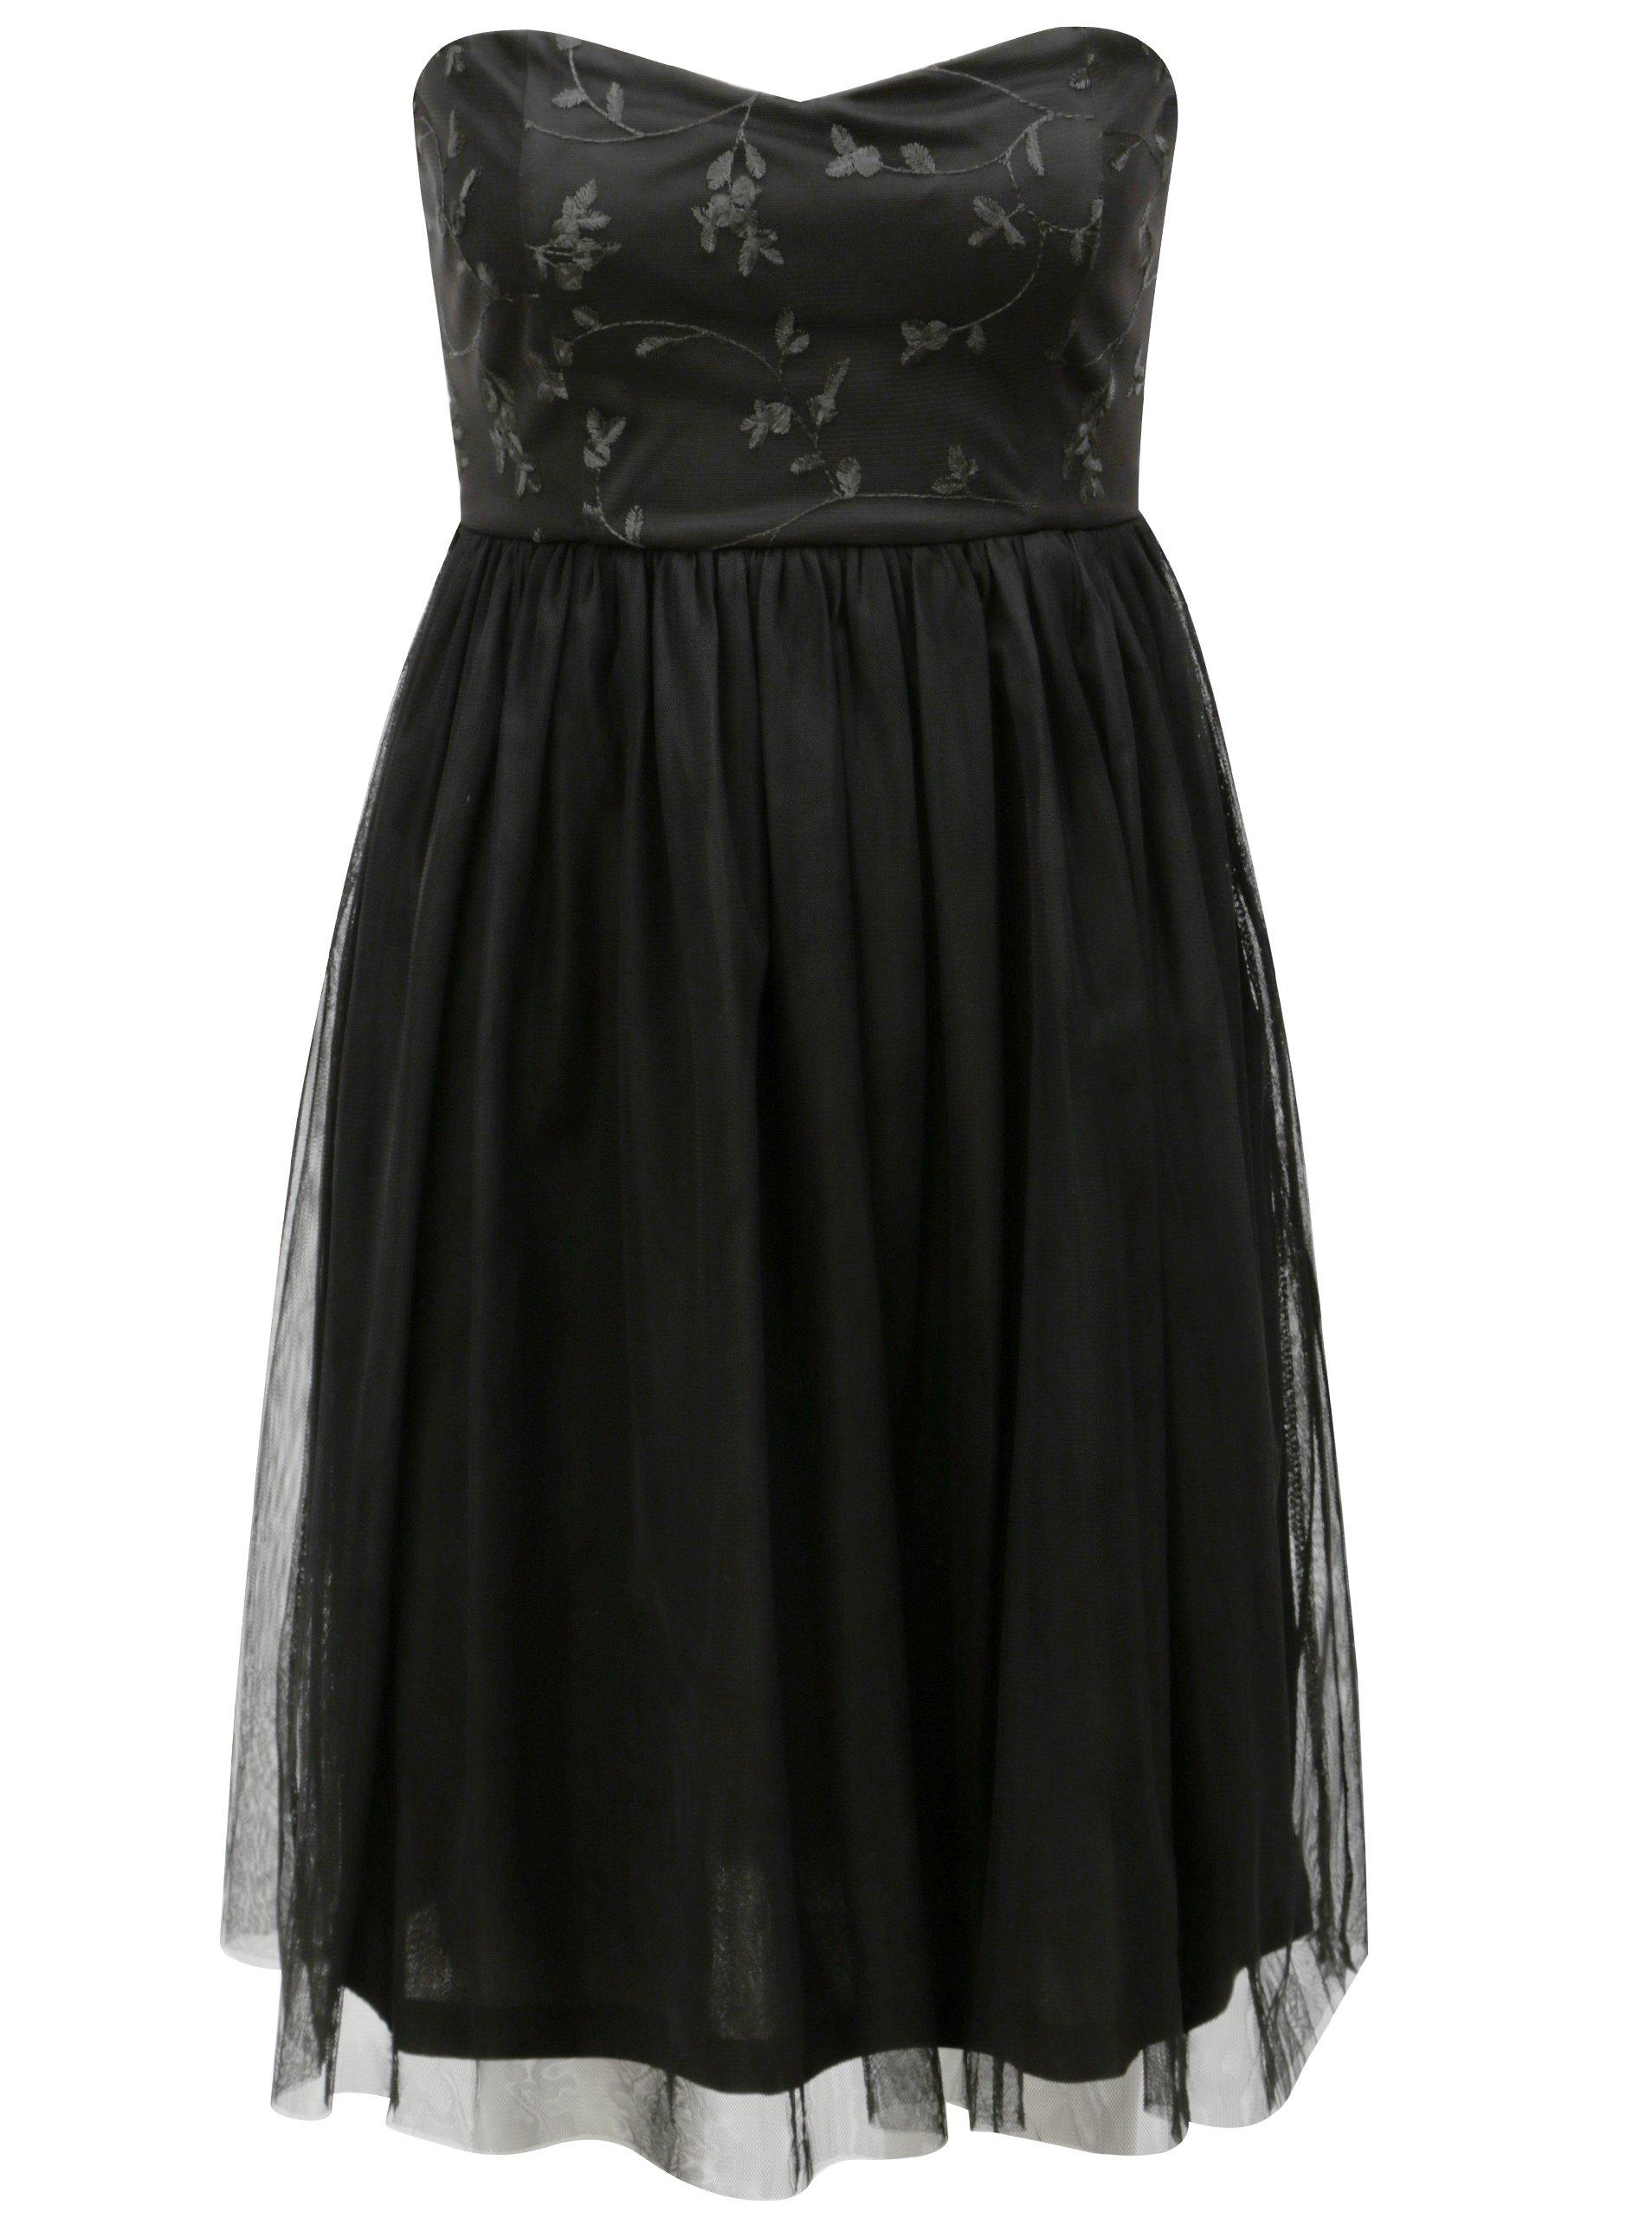 4cff01d2469f Čierne tylové šaty s prestrihom na chrbte ONLY Juhlia